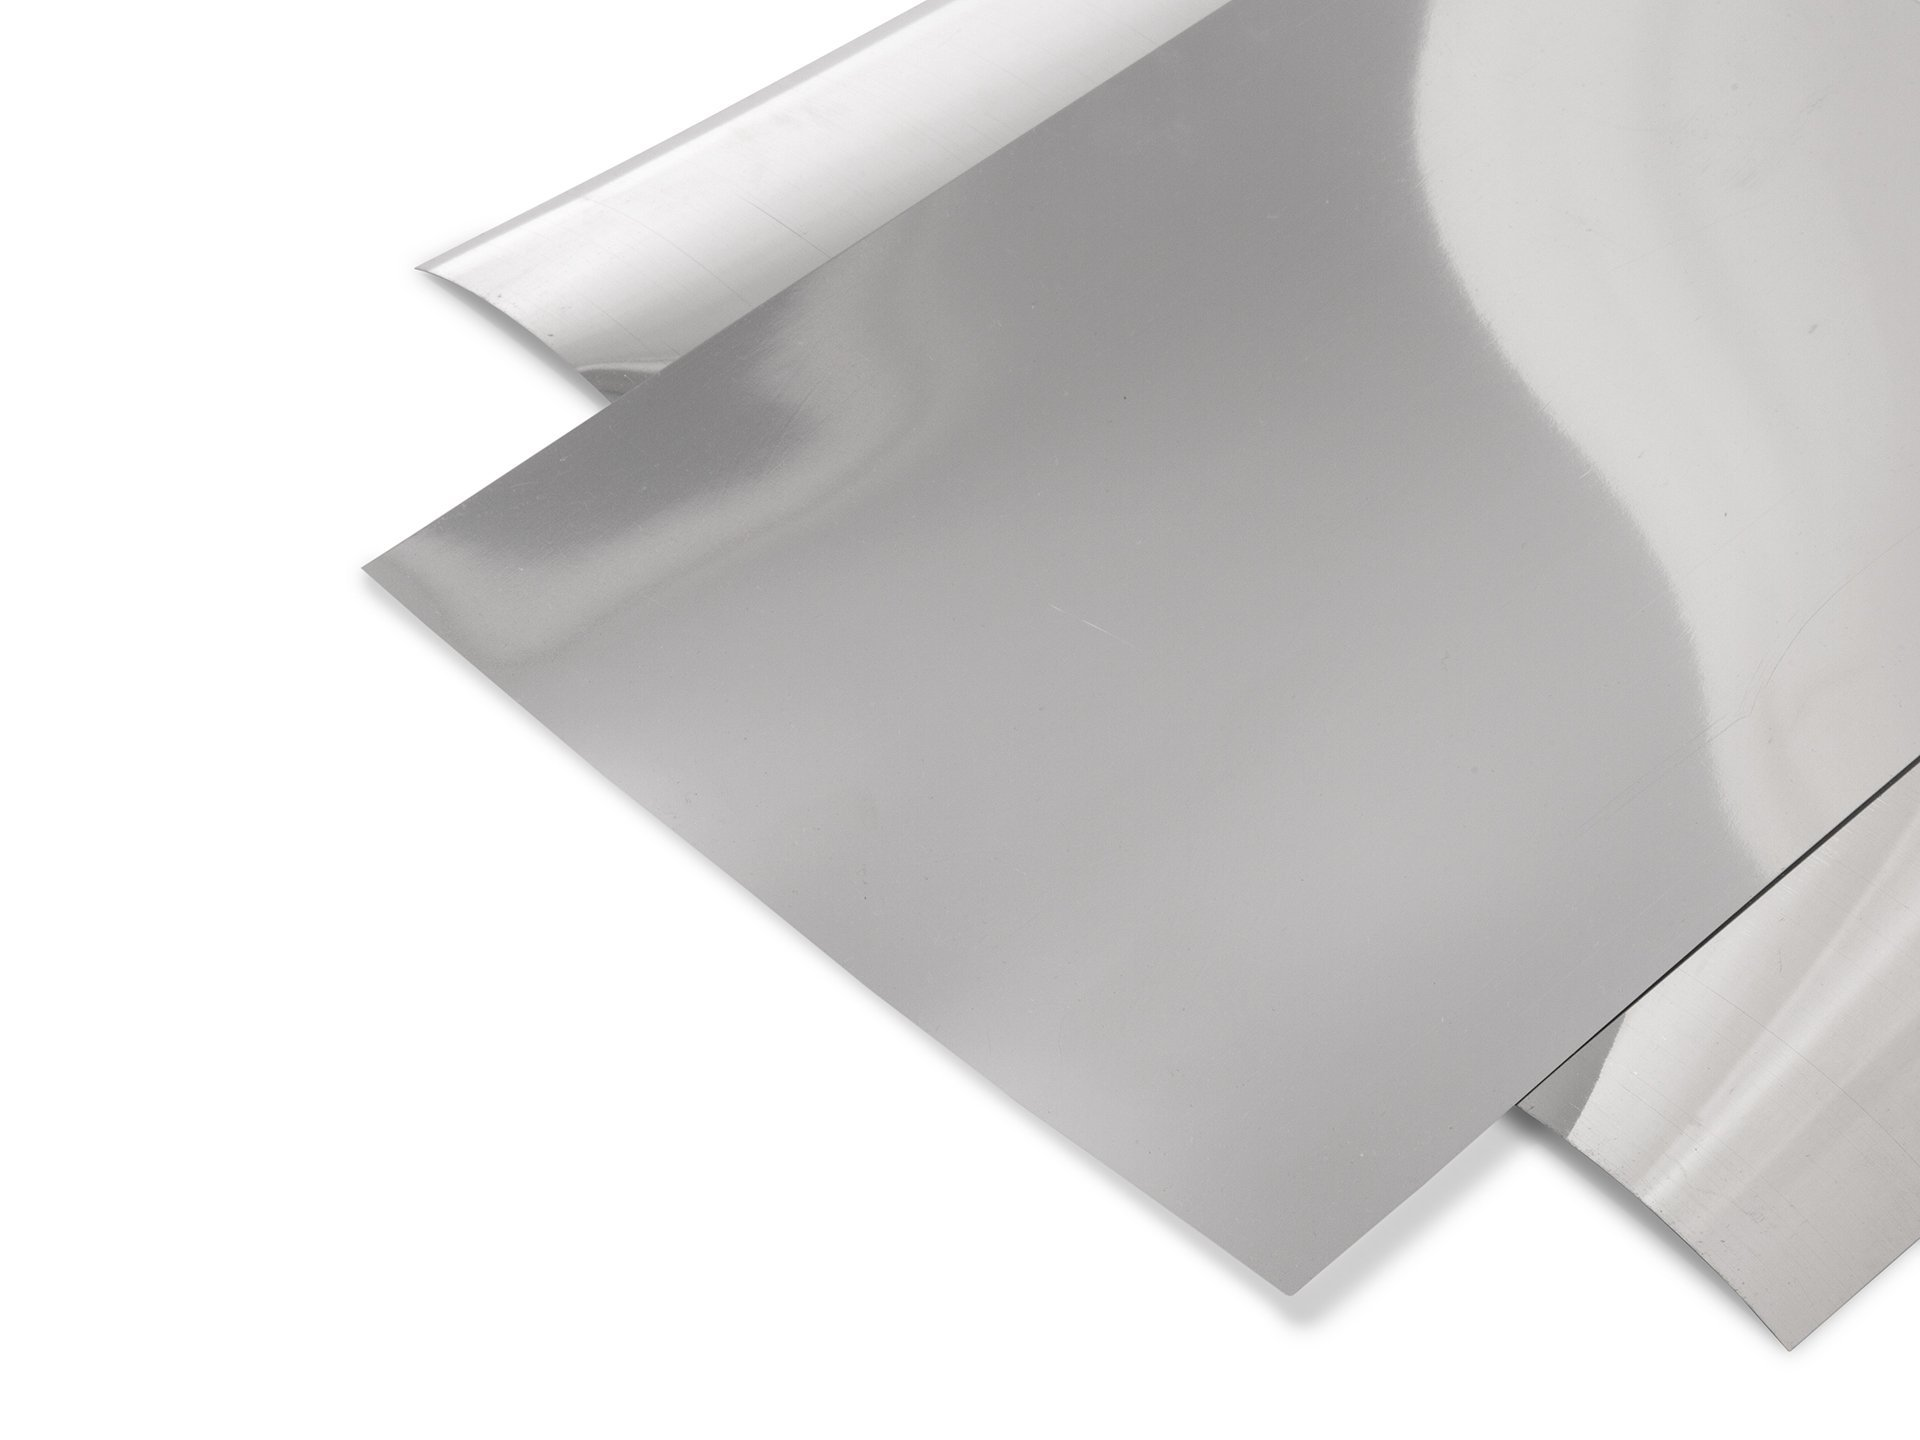 pvc hart spiegelfolie silber glatt kaufen modulor. Black Bedroom Furniture Sets. Home Design Ideas